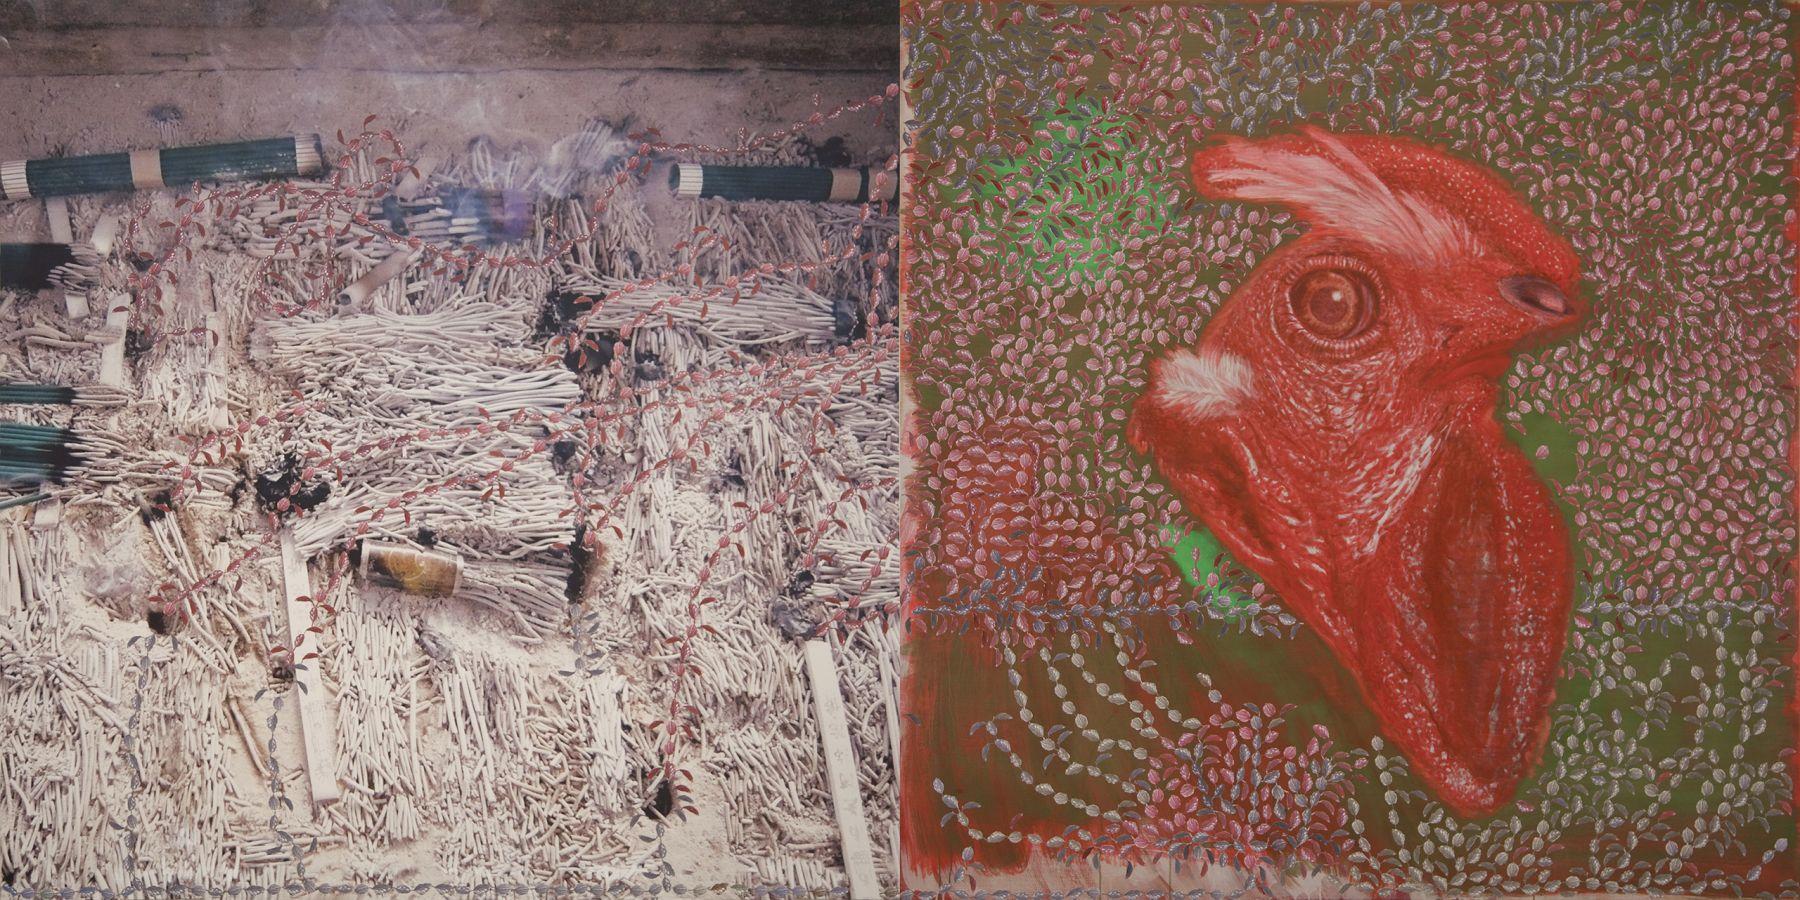 32. Back to the Future, 2009-2010, acrylic/tempera/collage/print/canvas, 200 x 400 cm